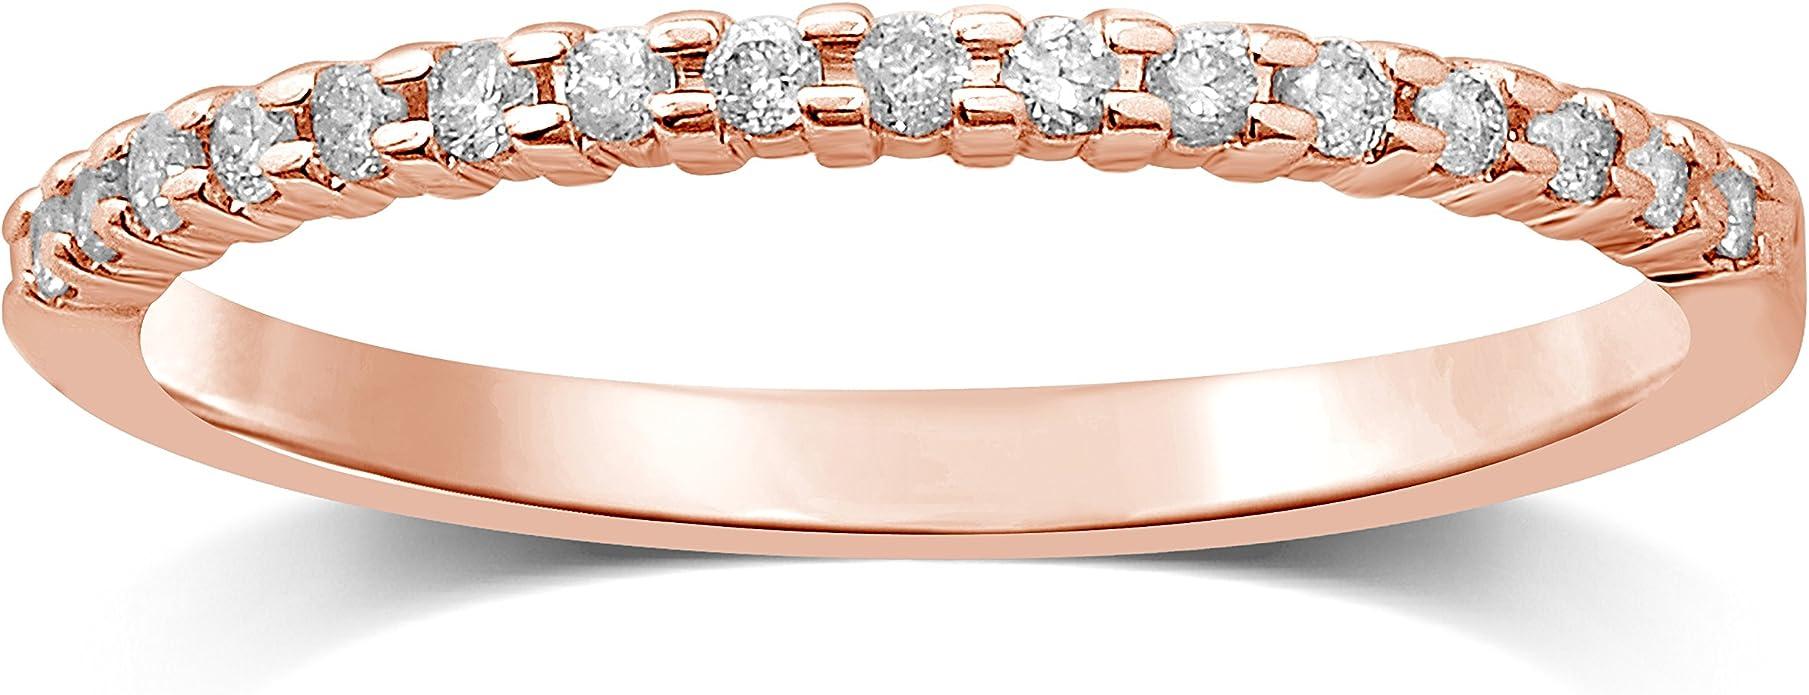 GlitzNvogue Pearl Stud Dangle Elegant Party Crystal Rhinestone Earrings in Gold for Girls Women